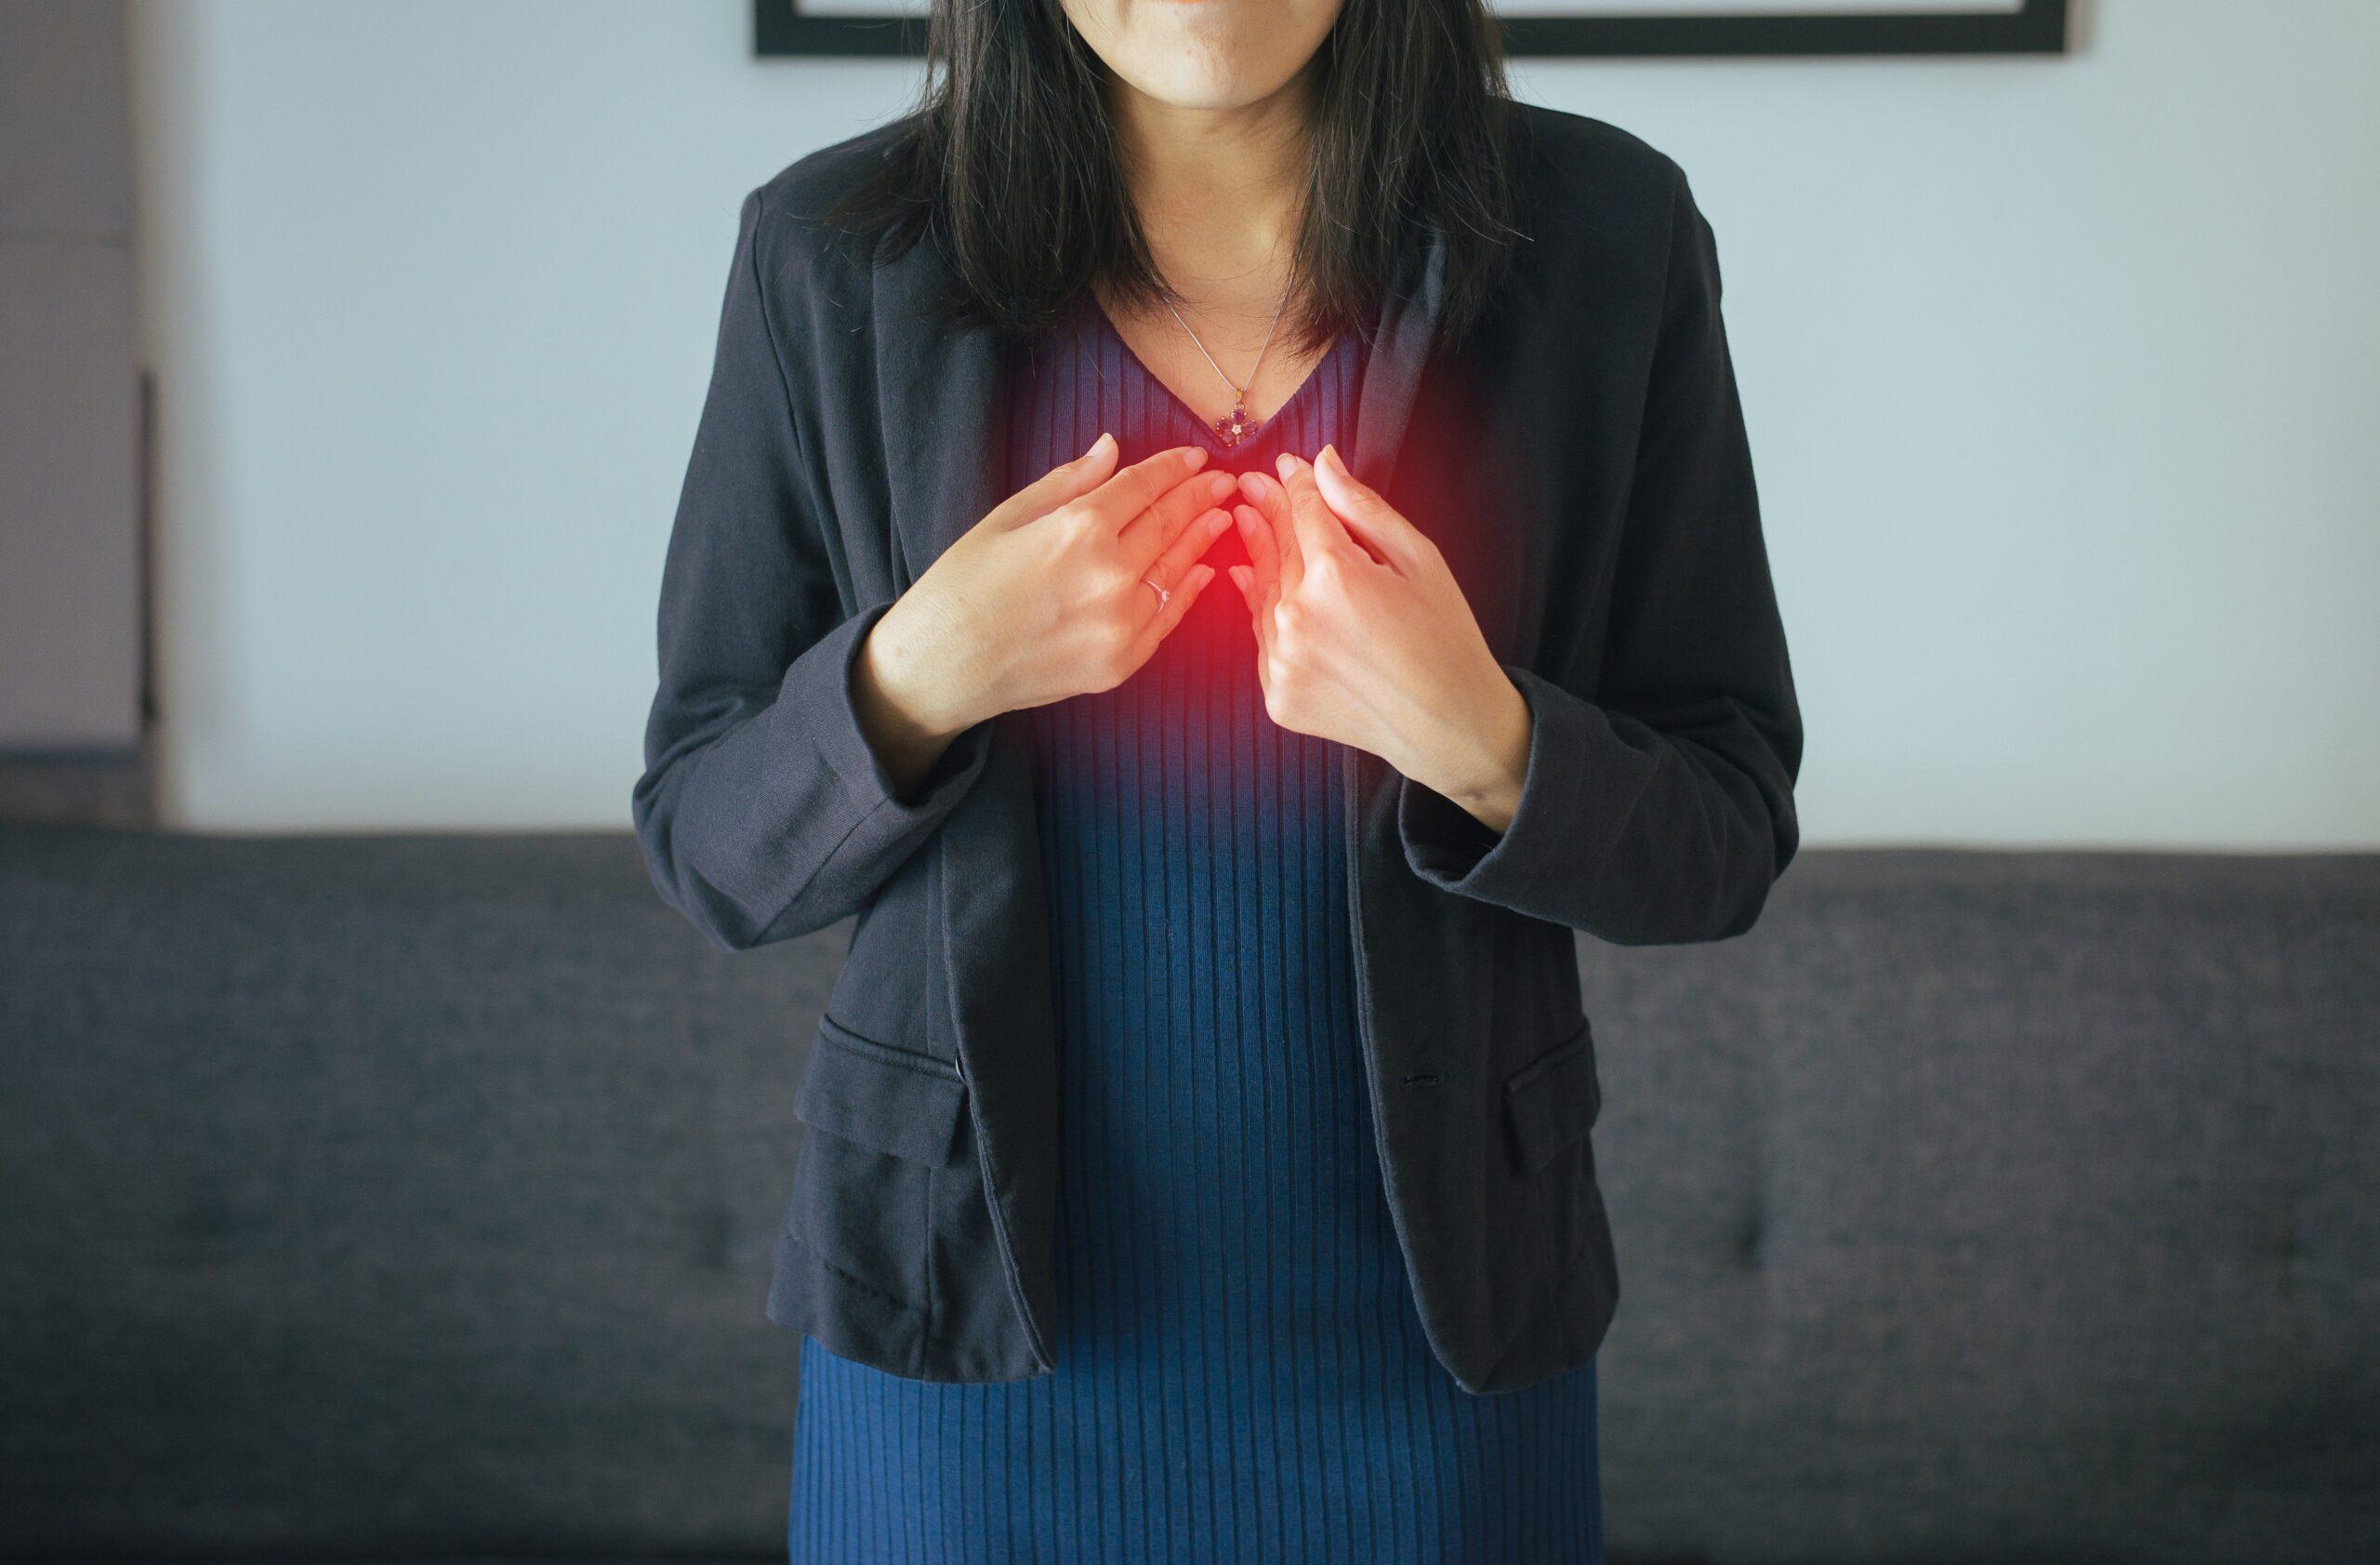 asian-women-having-or-symptomatic-reflux-acids-XY7ESLV